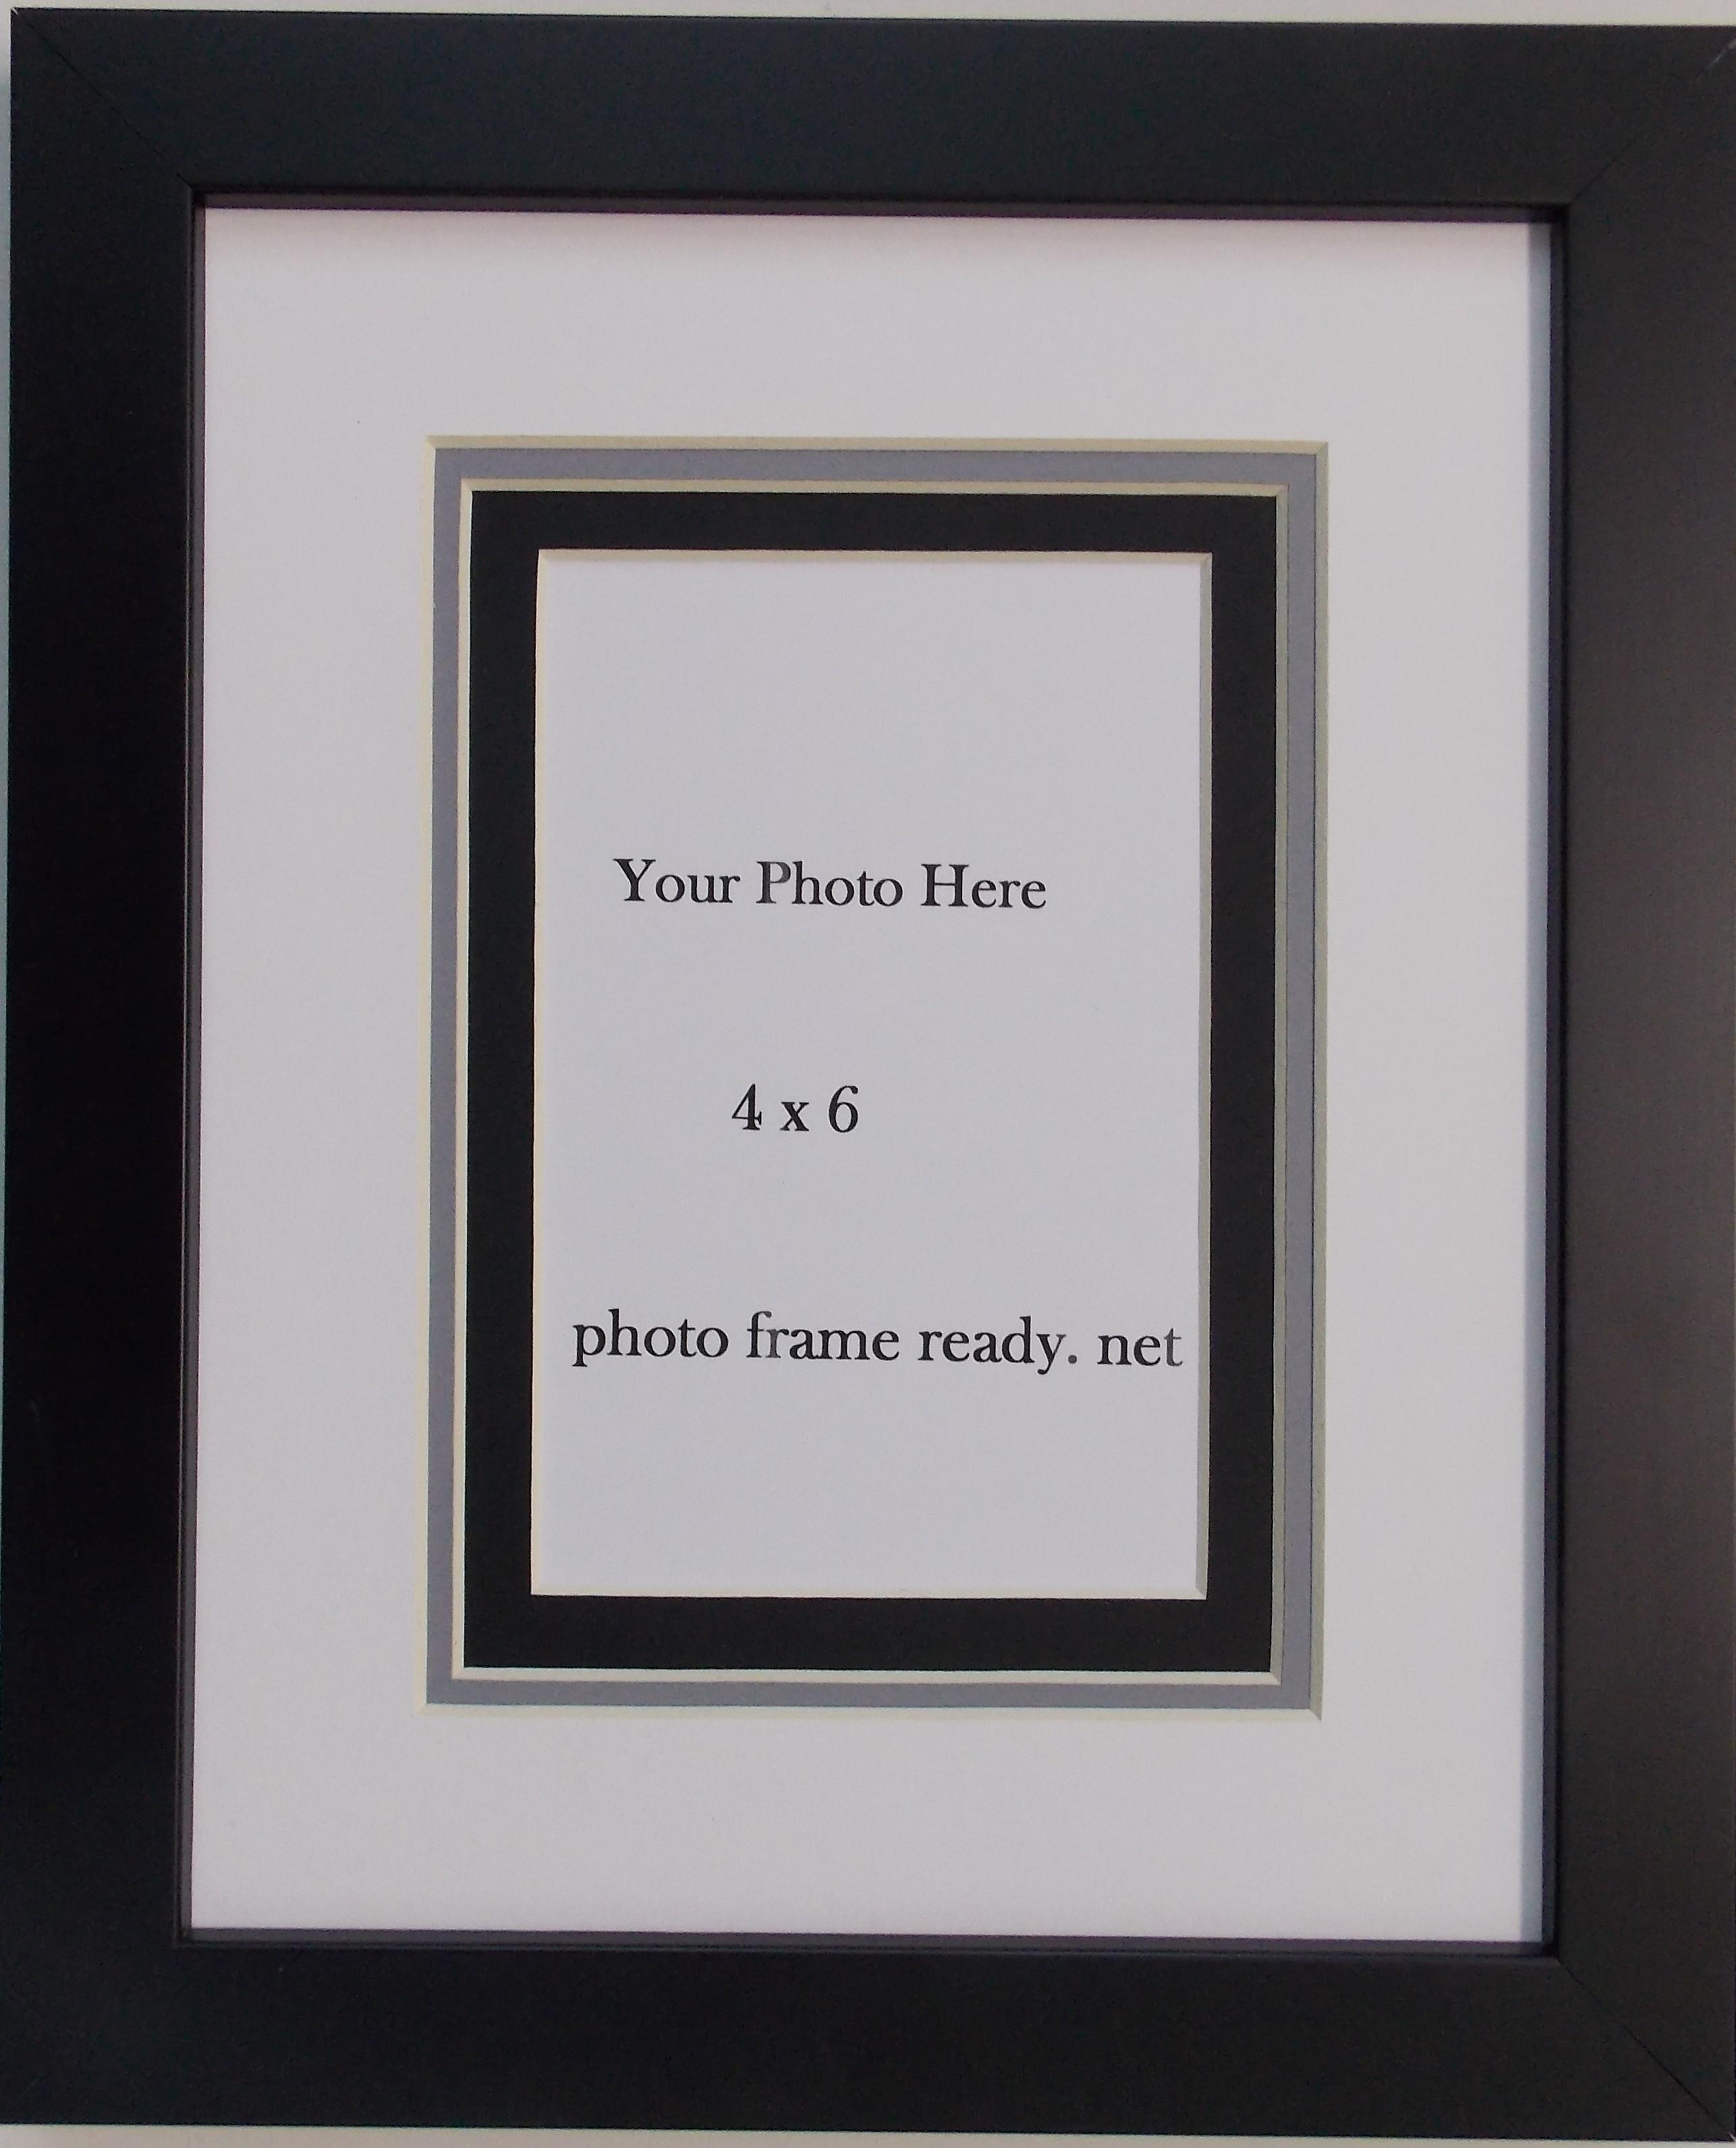 Triple Aperture Mounts for 6x4 inch photos